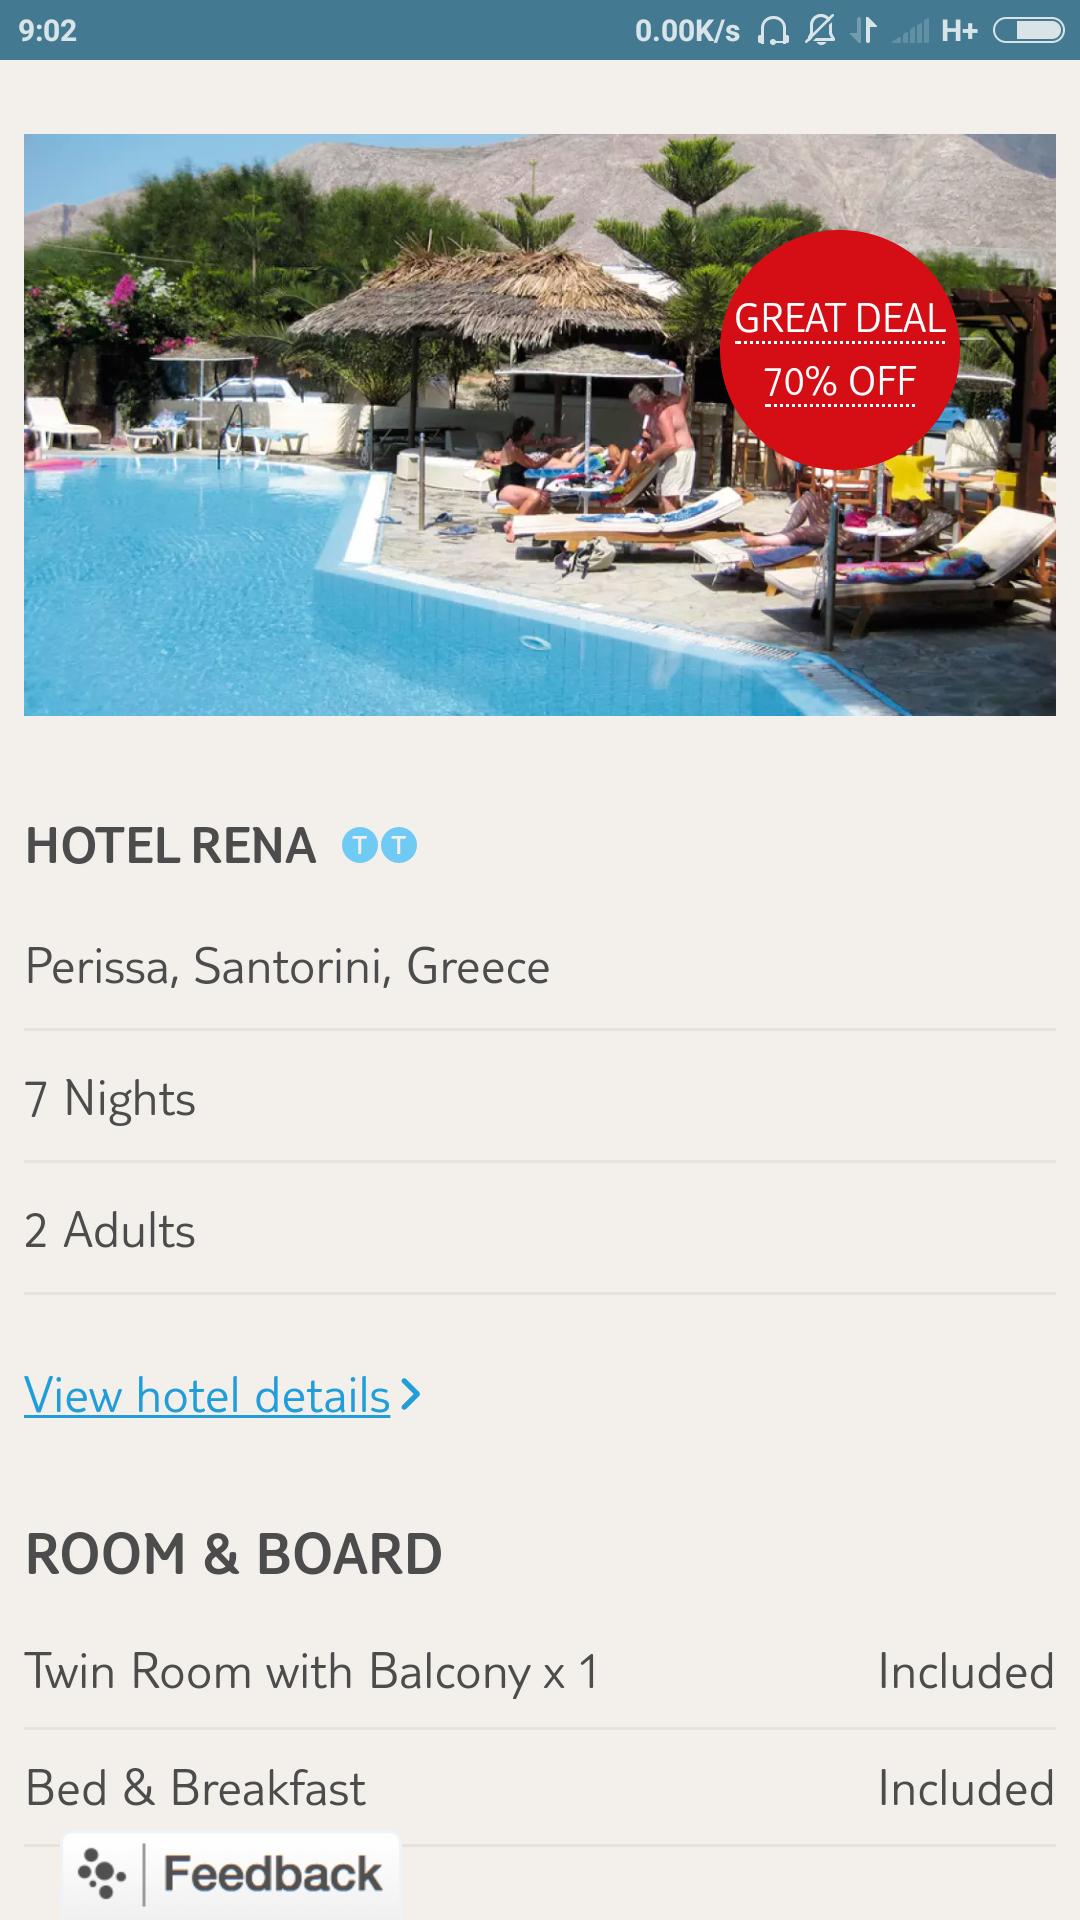 From London: 1 Week in Santorini Inc Flights, Luggage, Transfers & Accommodation on B&B basis - 1 May £134.10pp @ Tui